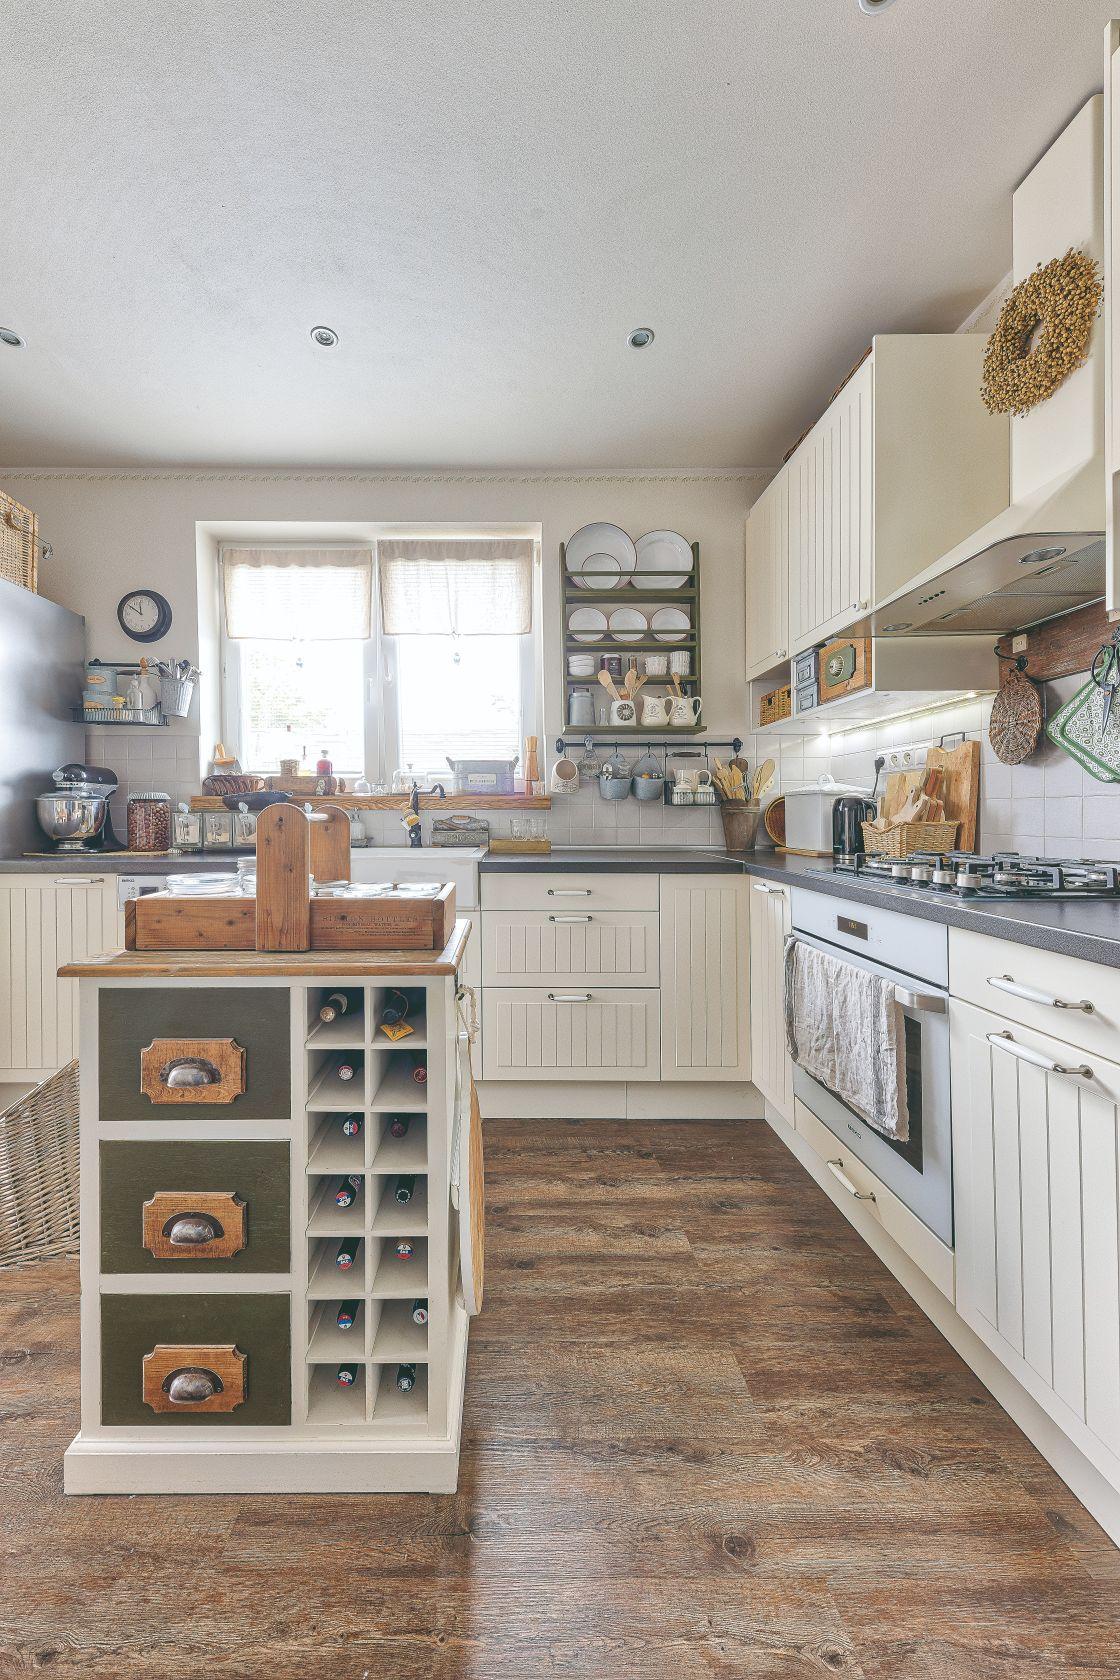 Venkovská kuchyň s miniostrůvkem